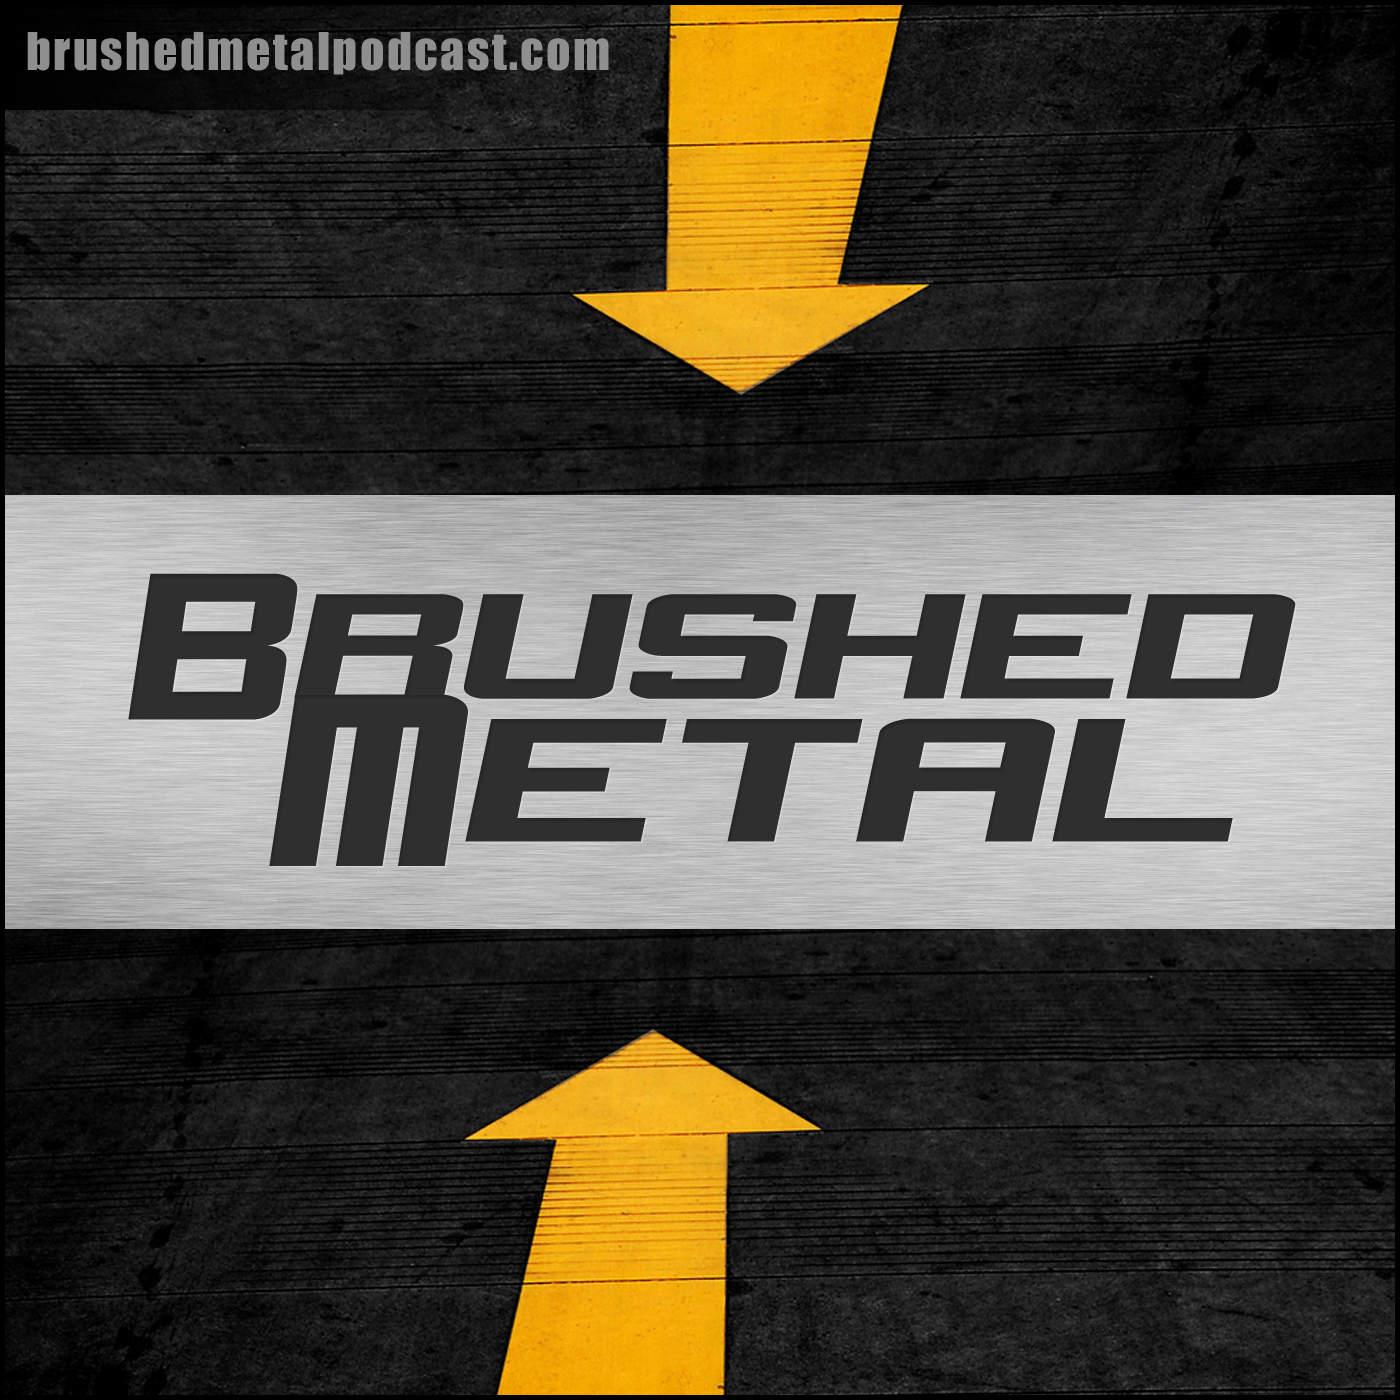 Brushed Metal Podcast